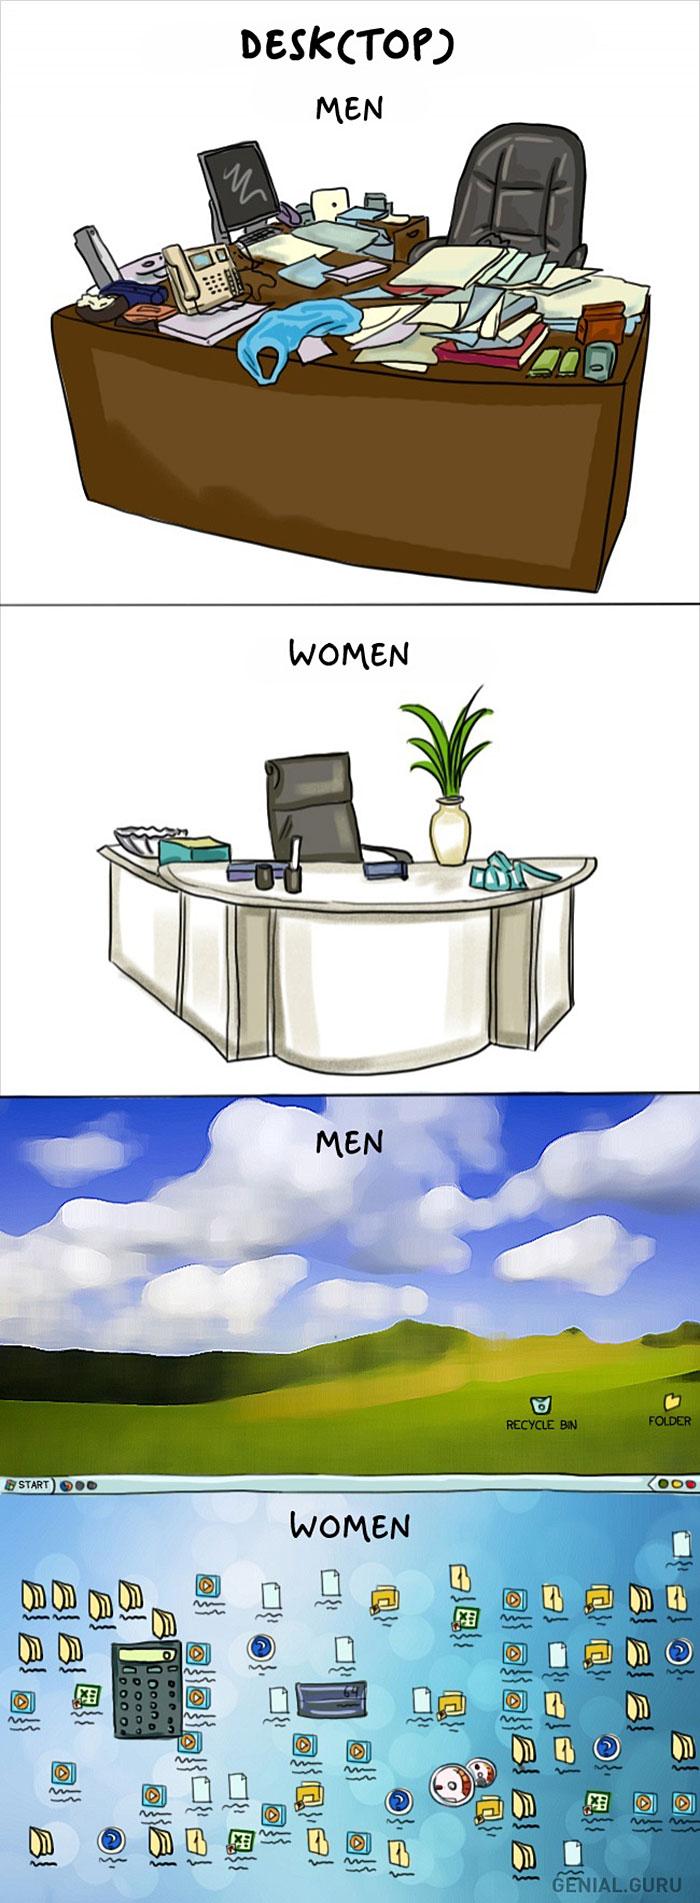 men-women-differences-comic-bright-side-151__700